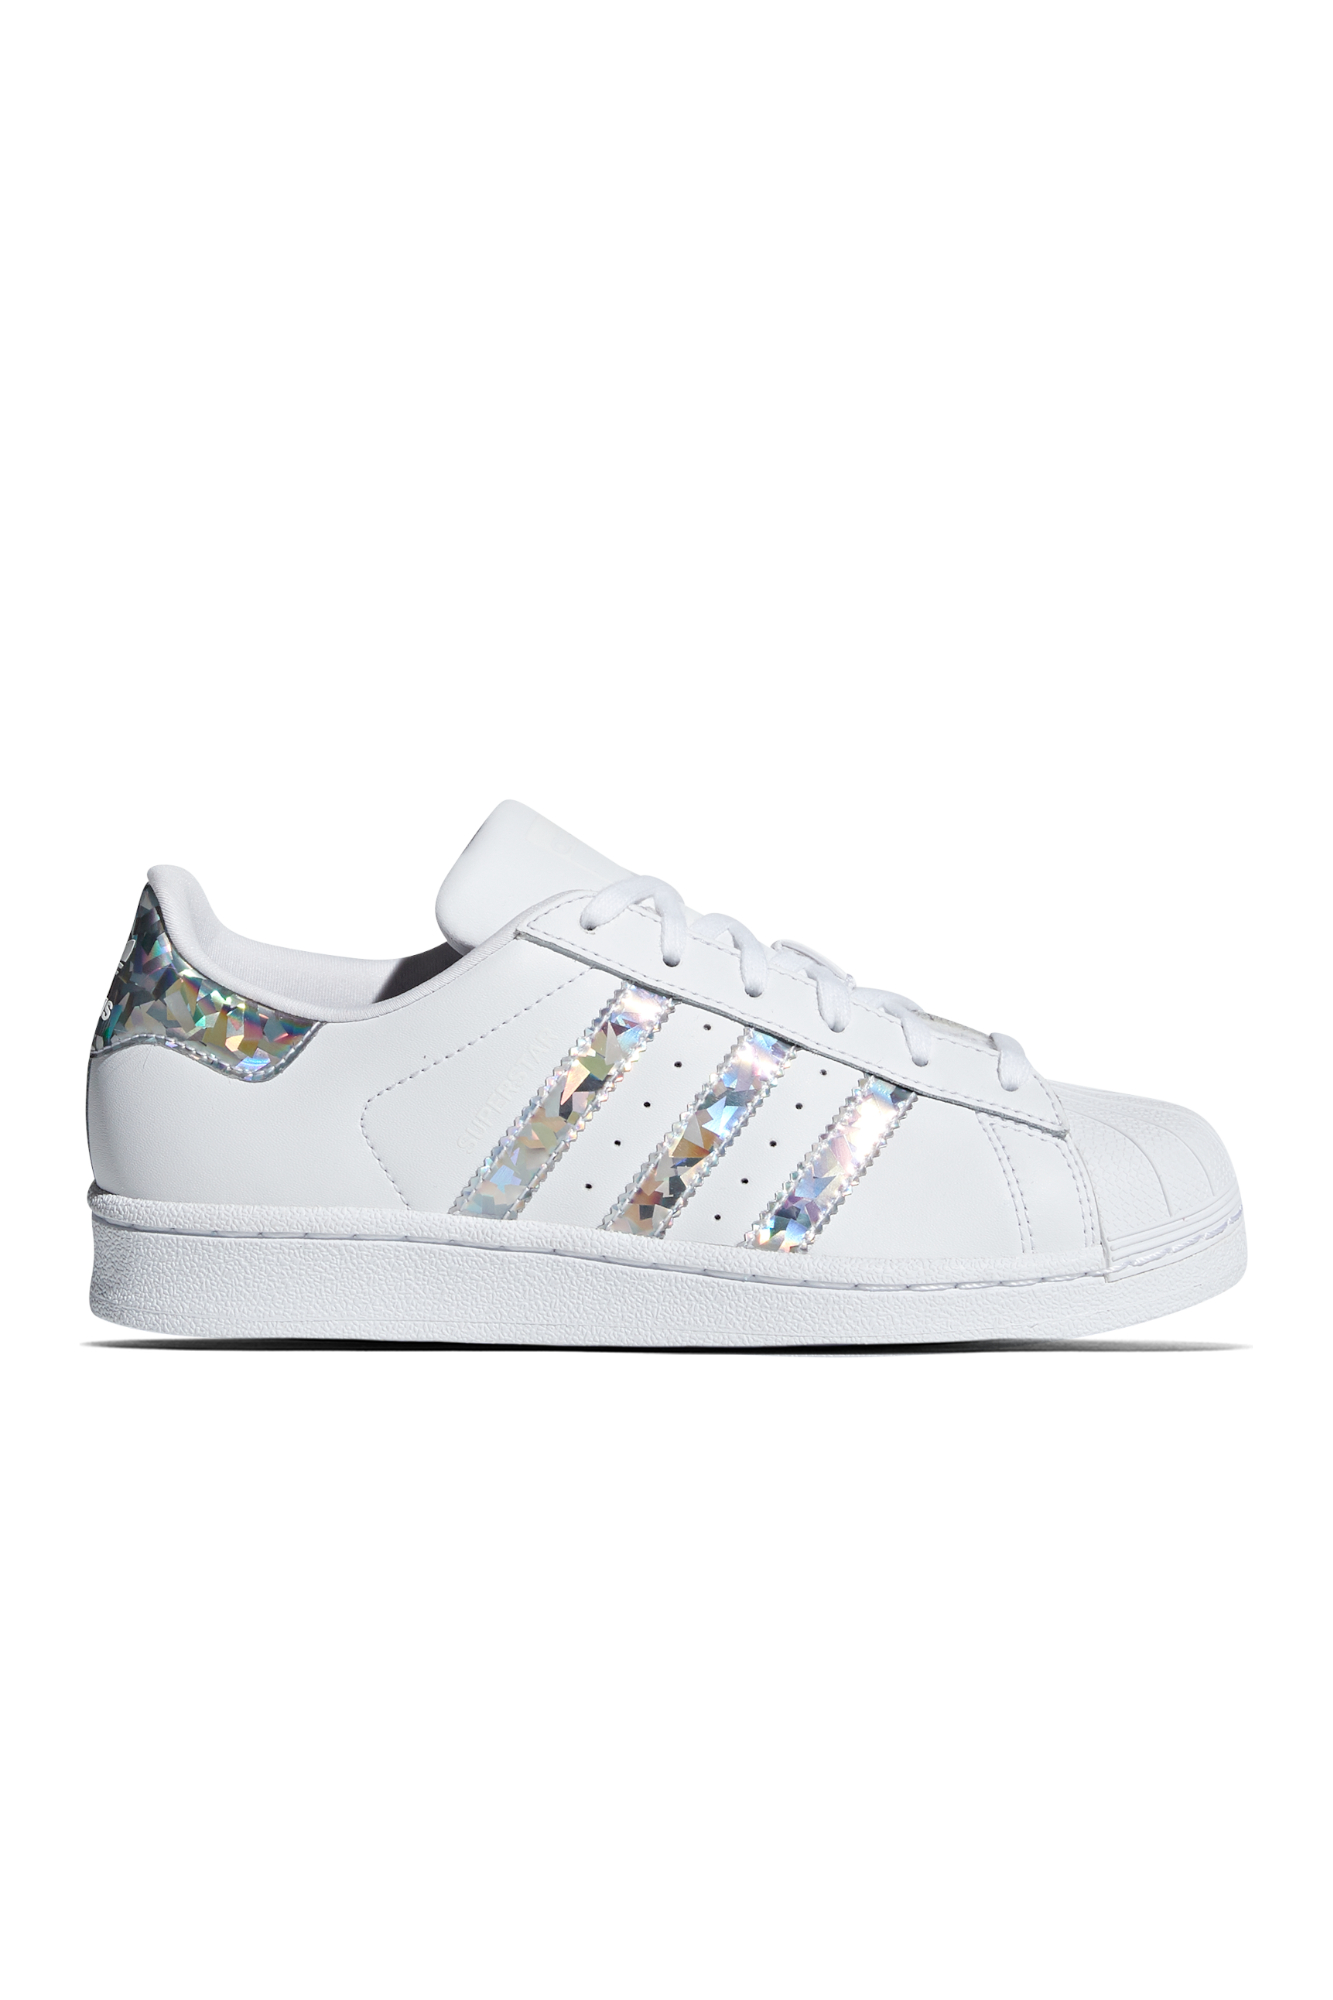 511e049db92 Buty adidas Originals Superstar - F33889   Na co dzień   Buty ...